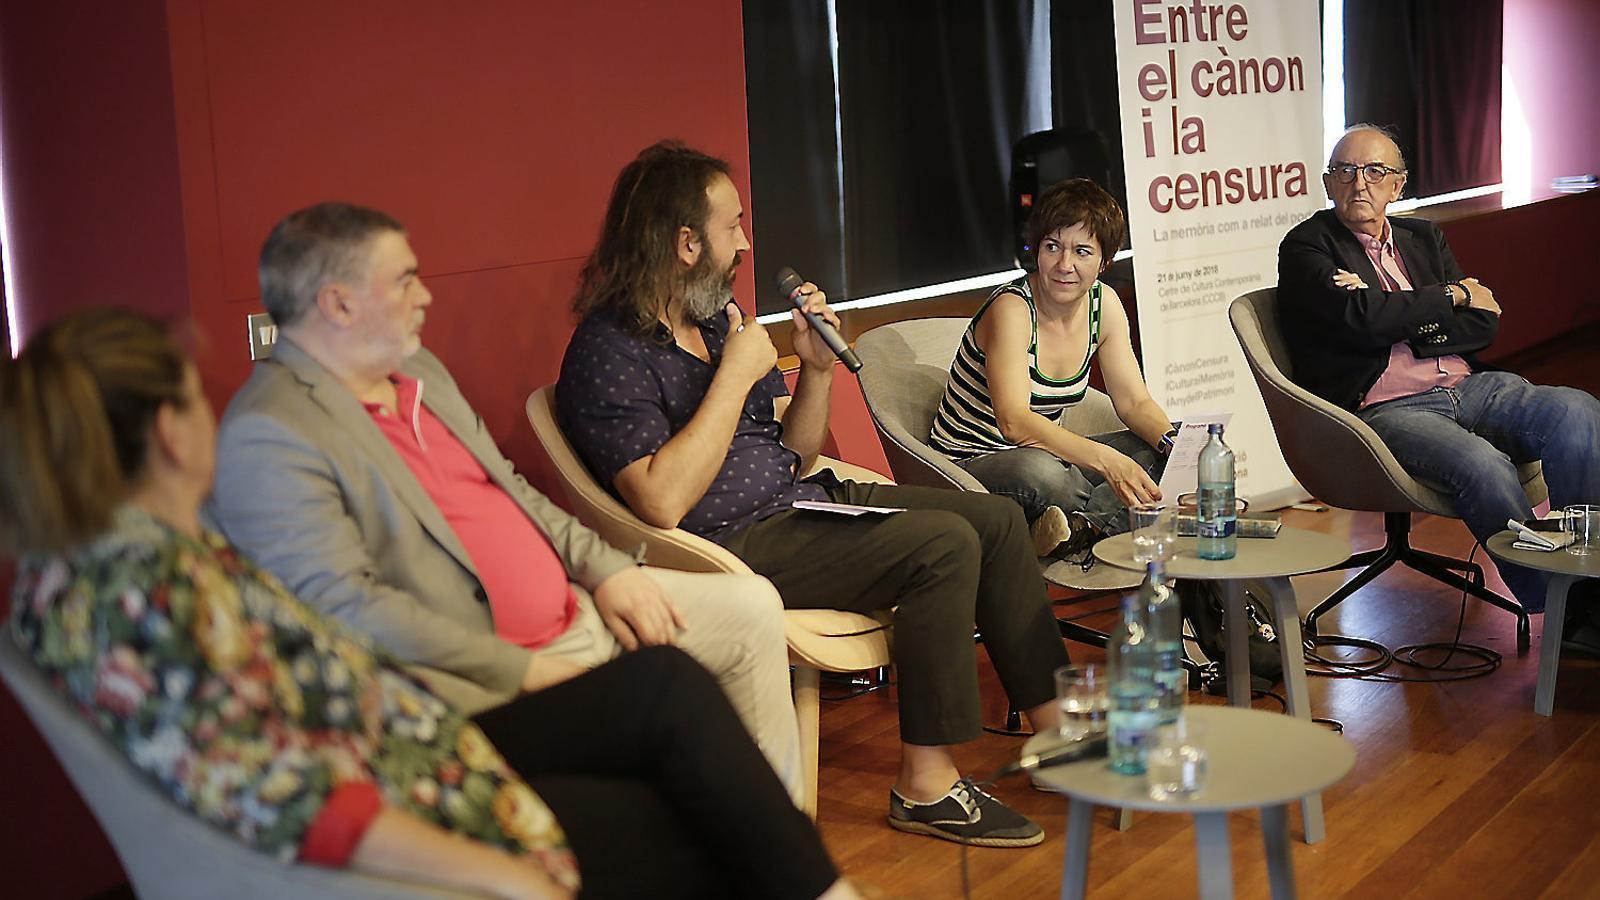 Isona Passola, Xavier Albertí, AndreuGomila (moderador), Empar Moliner i Jaume Roures.